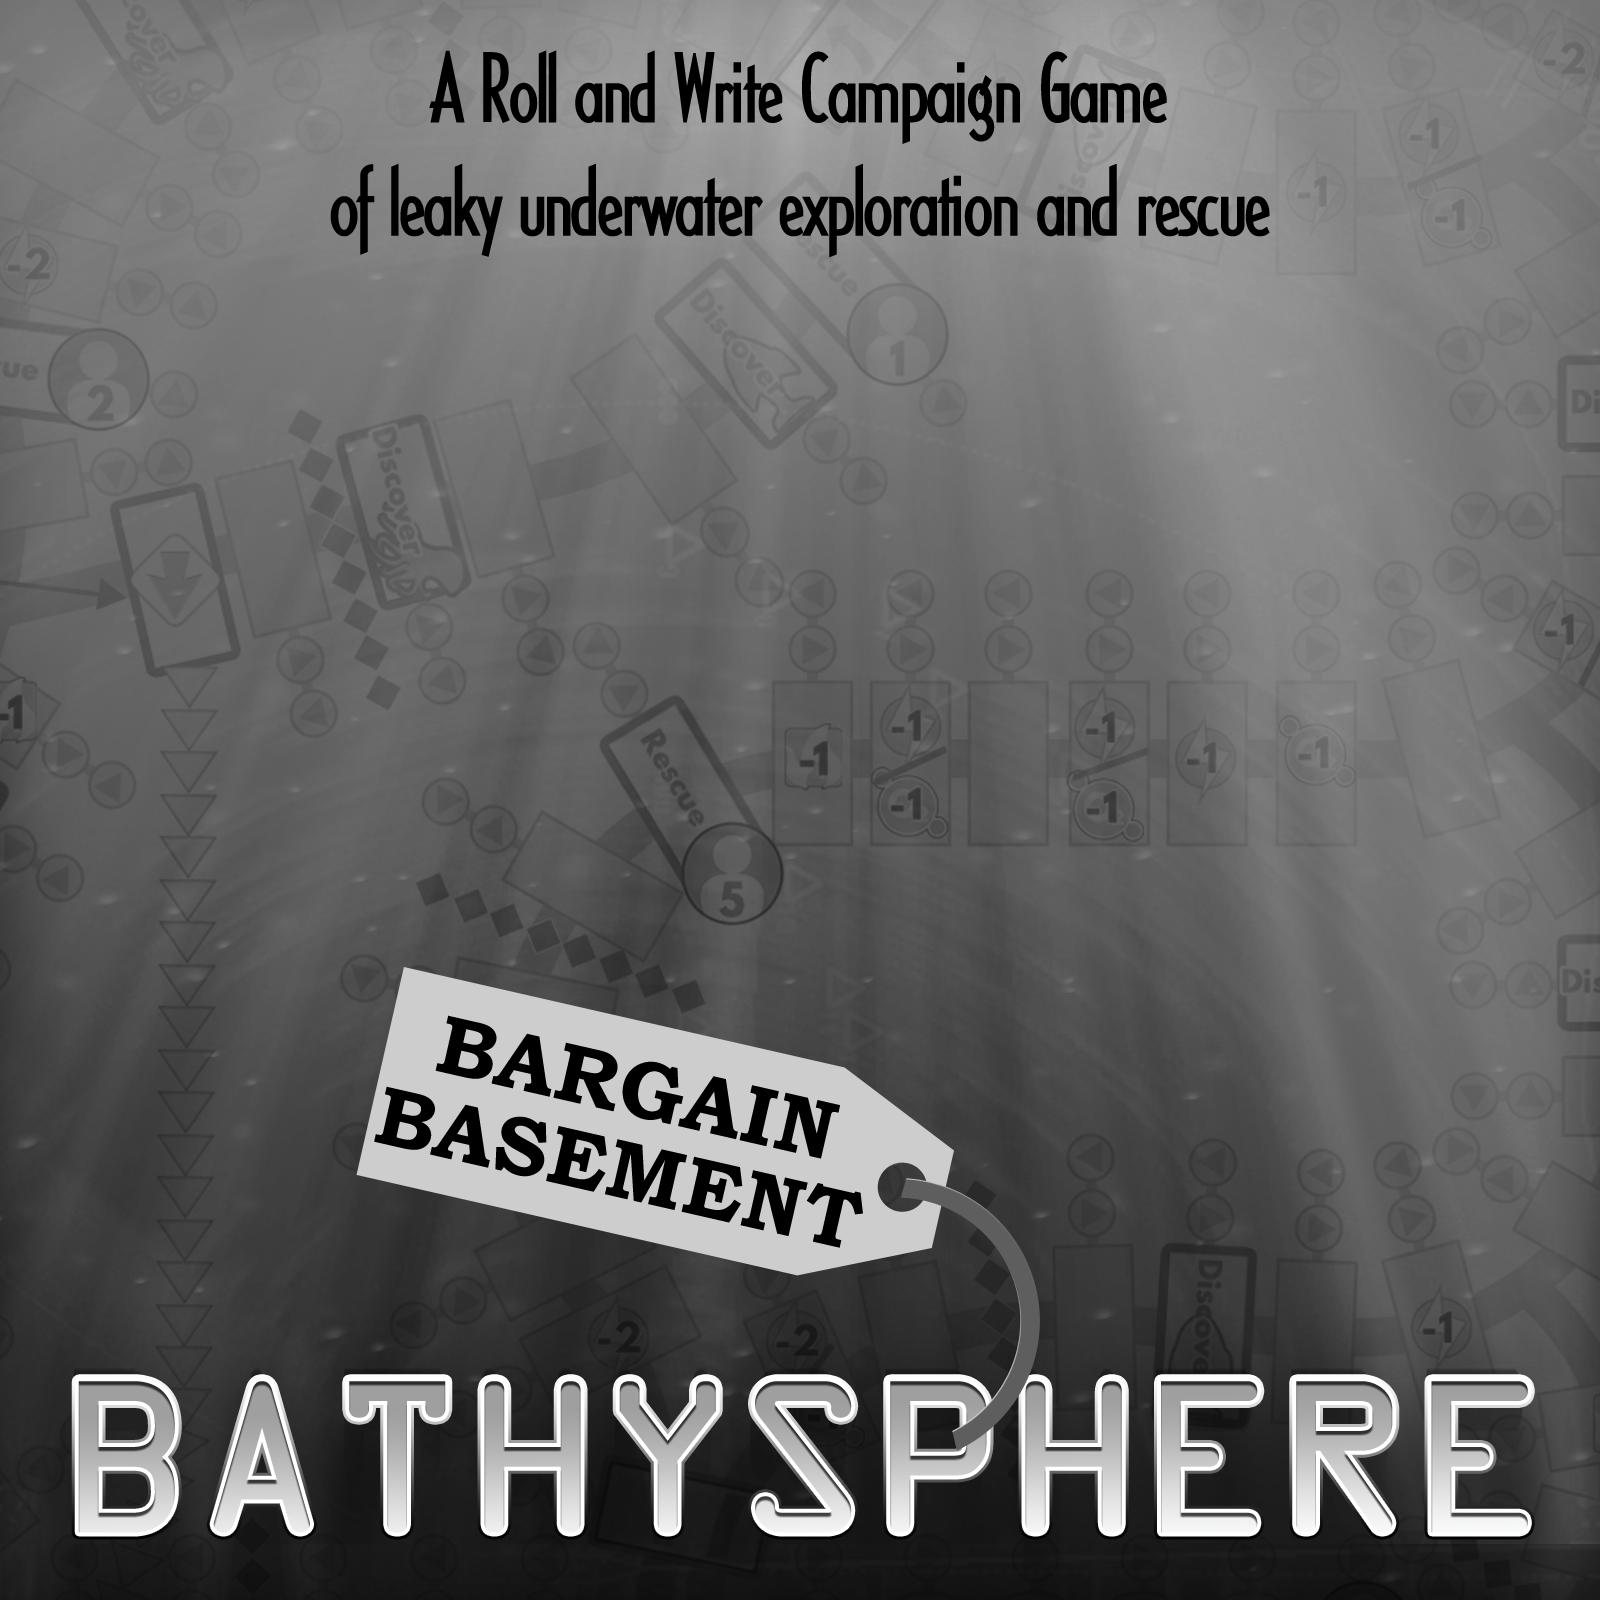 Bargain Basement Bathysphere